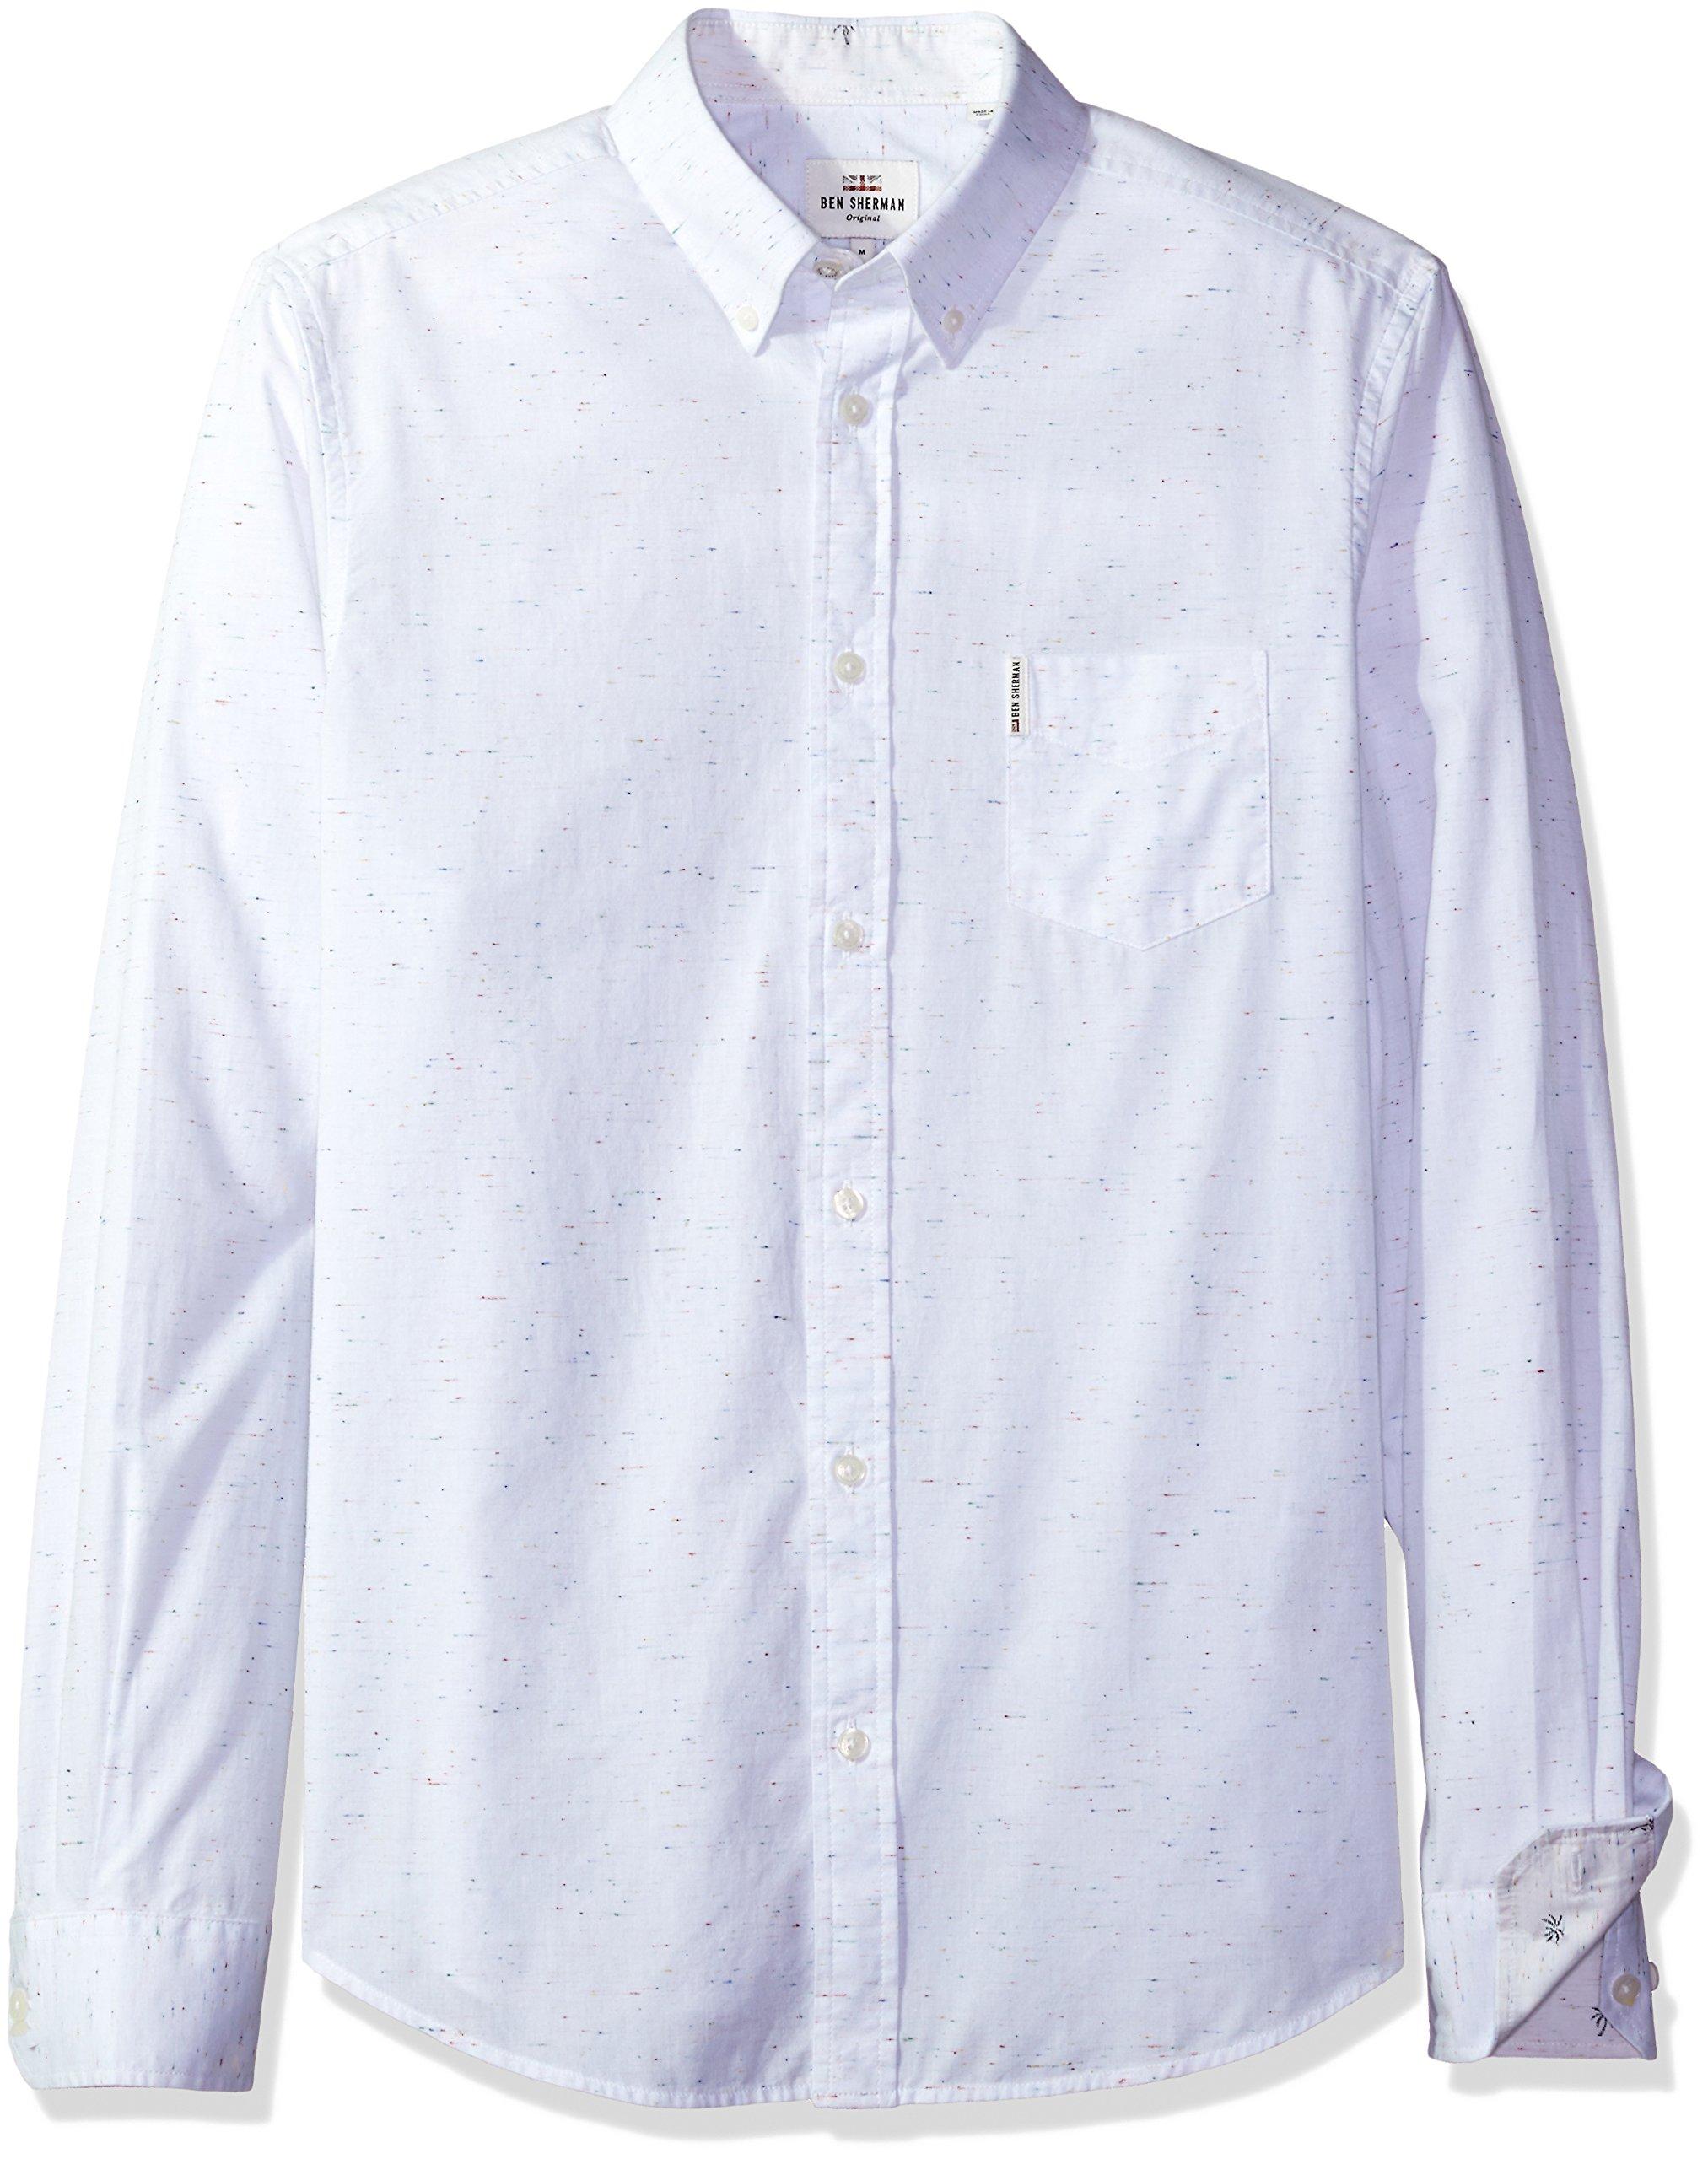 Ben Sherman Men's Long Sleeve Modern Print Summer, Bright White, Large